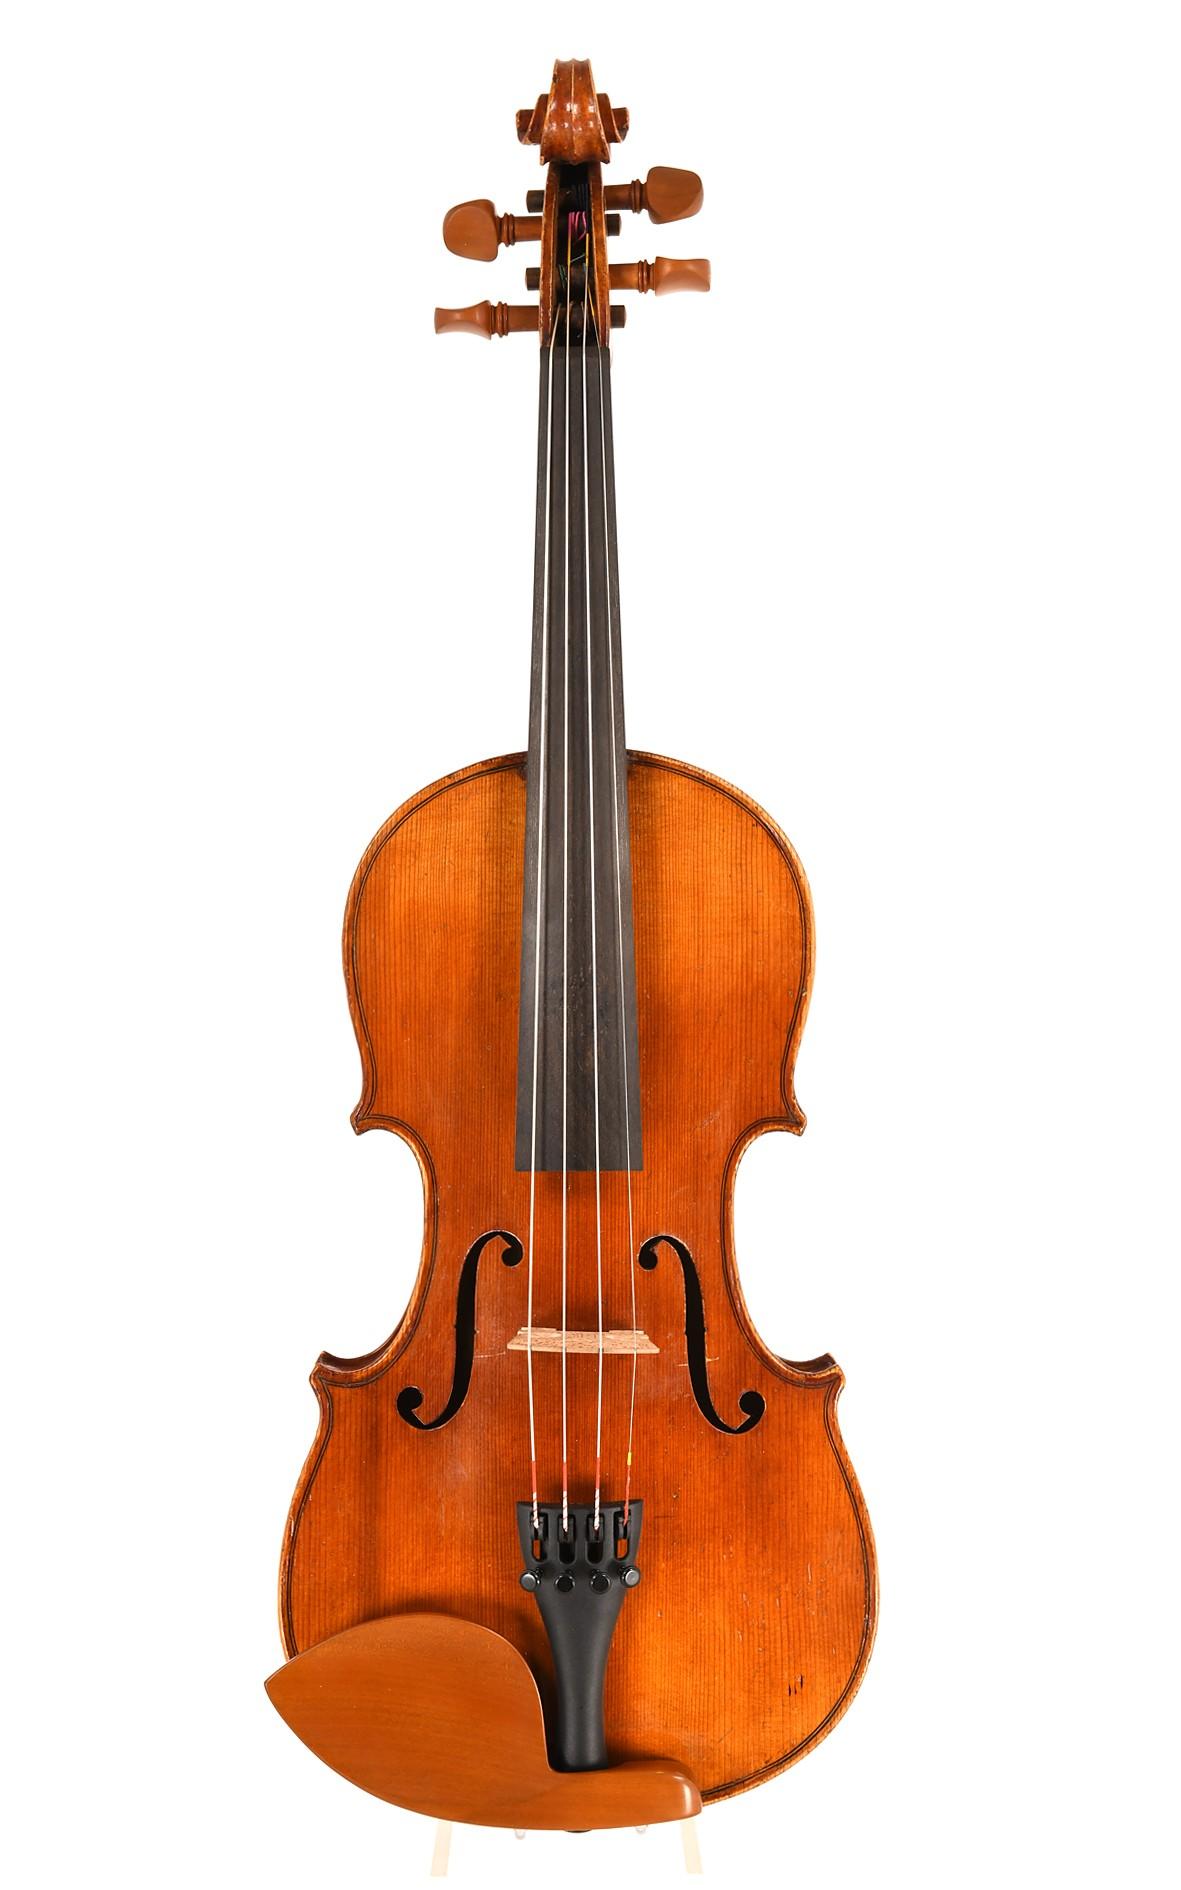 Mittenwald 3/4 violin, approx. 1880 - top